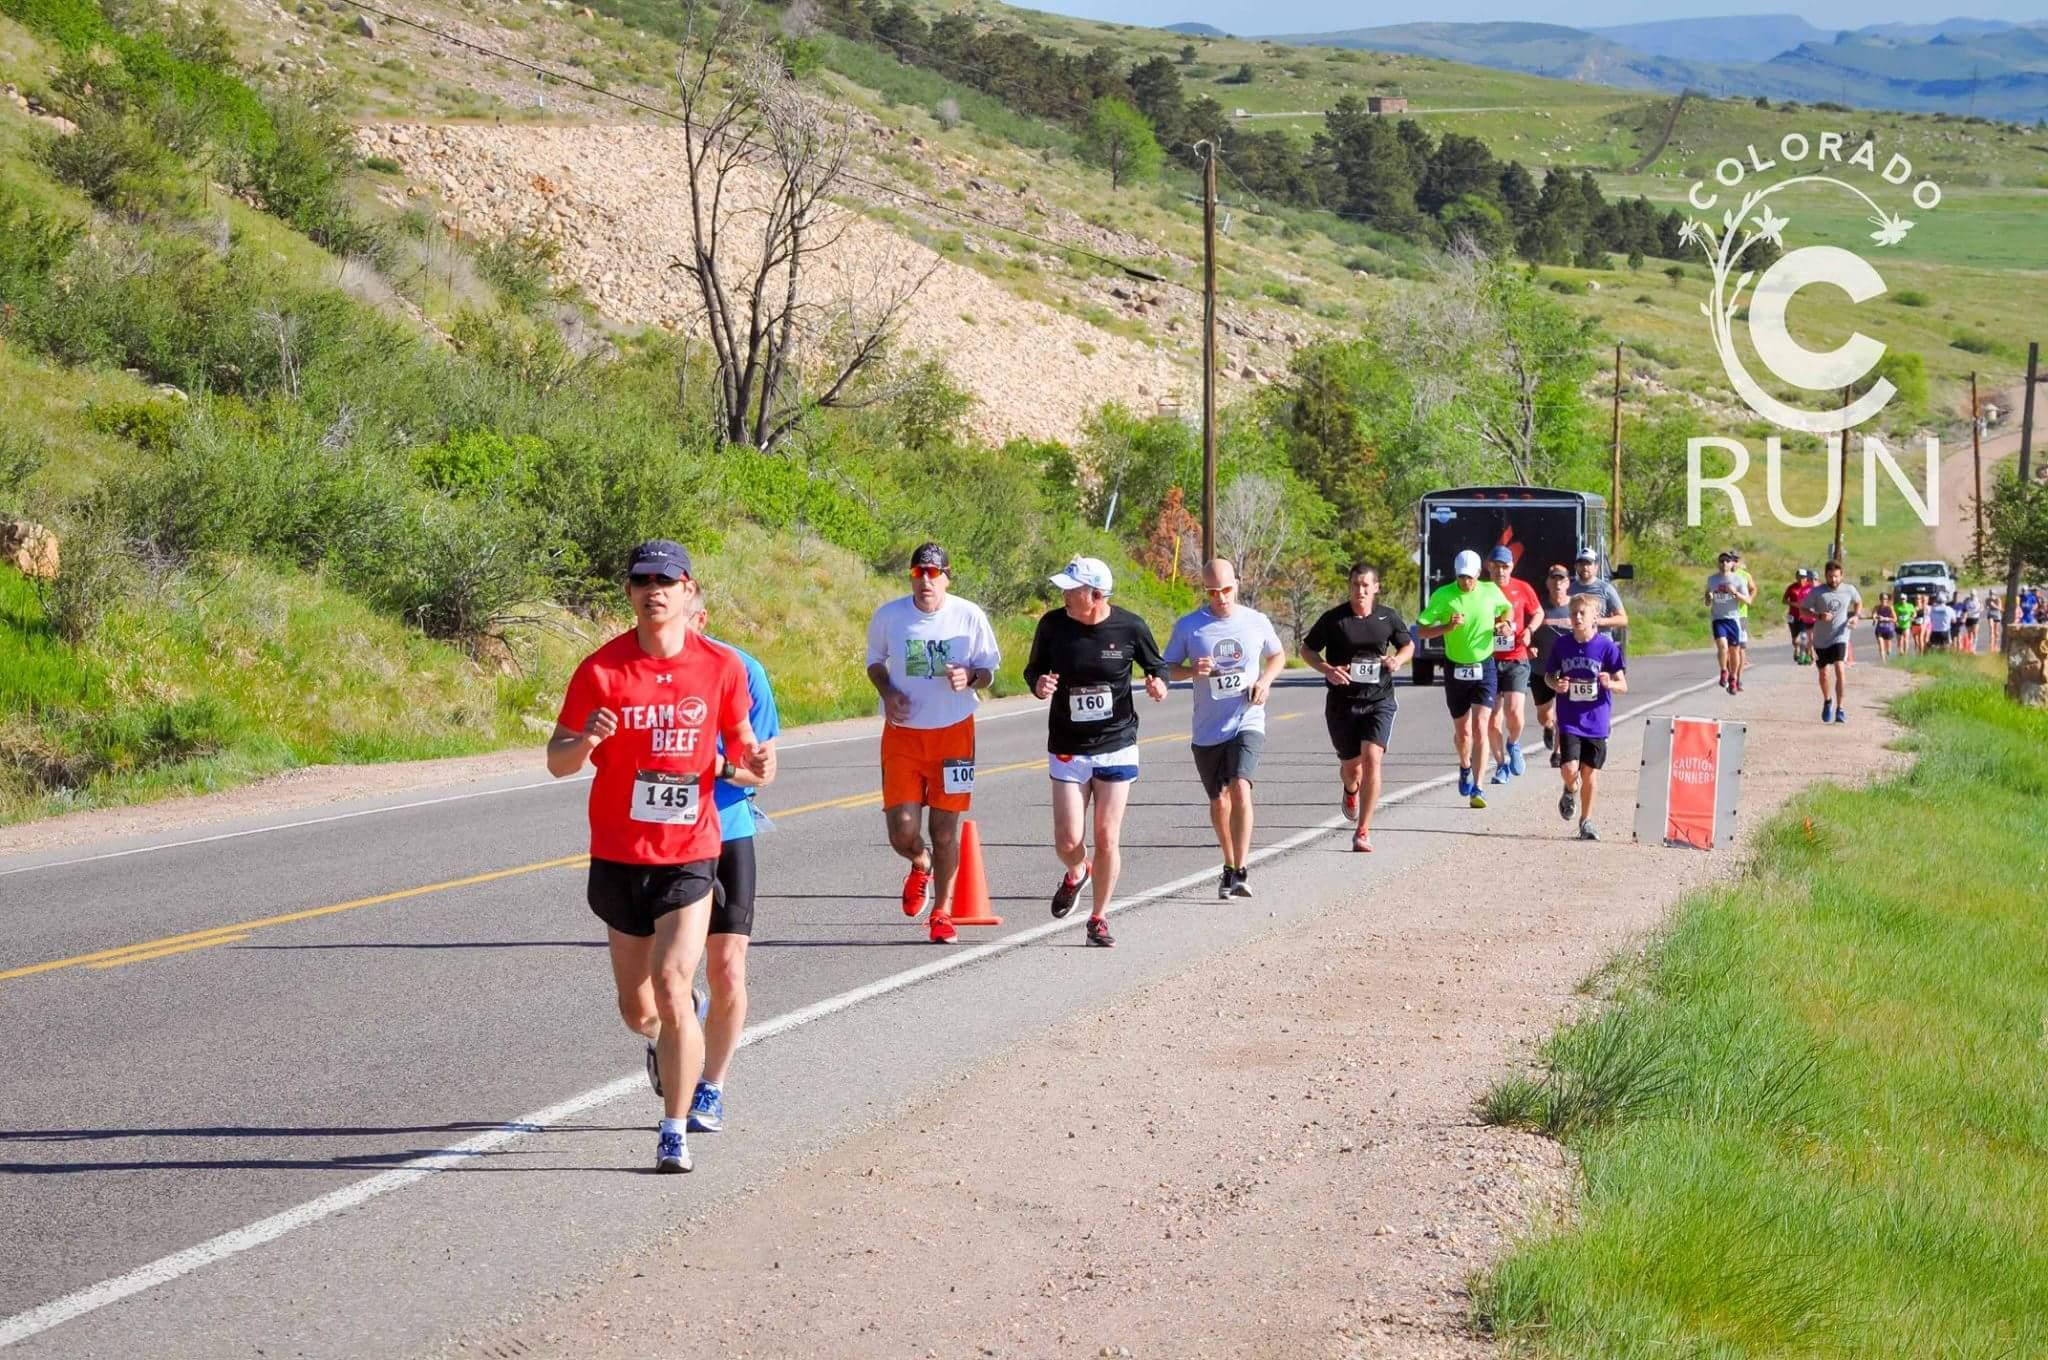 Featured photo for Colorado Run 10k